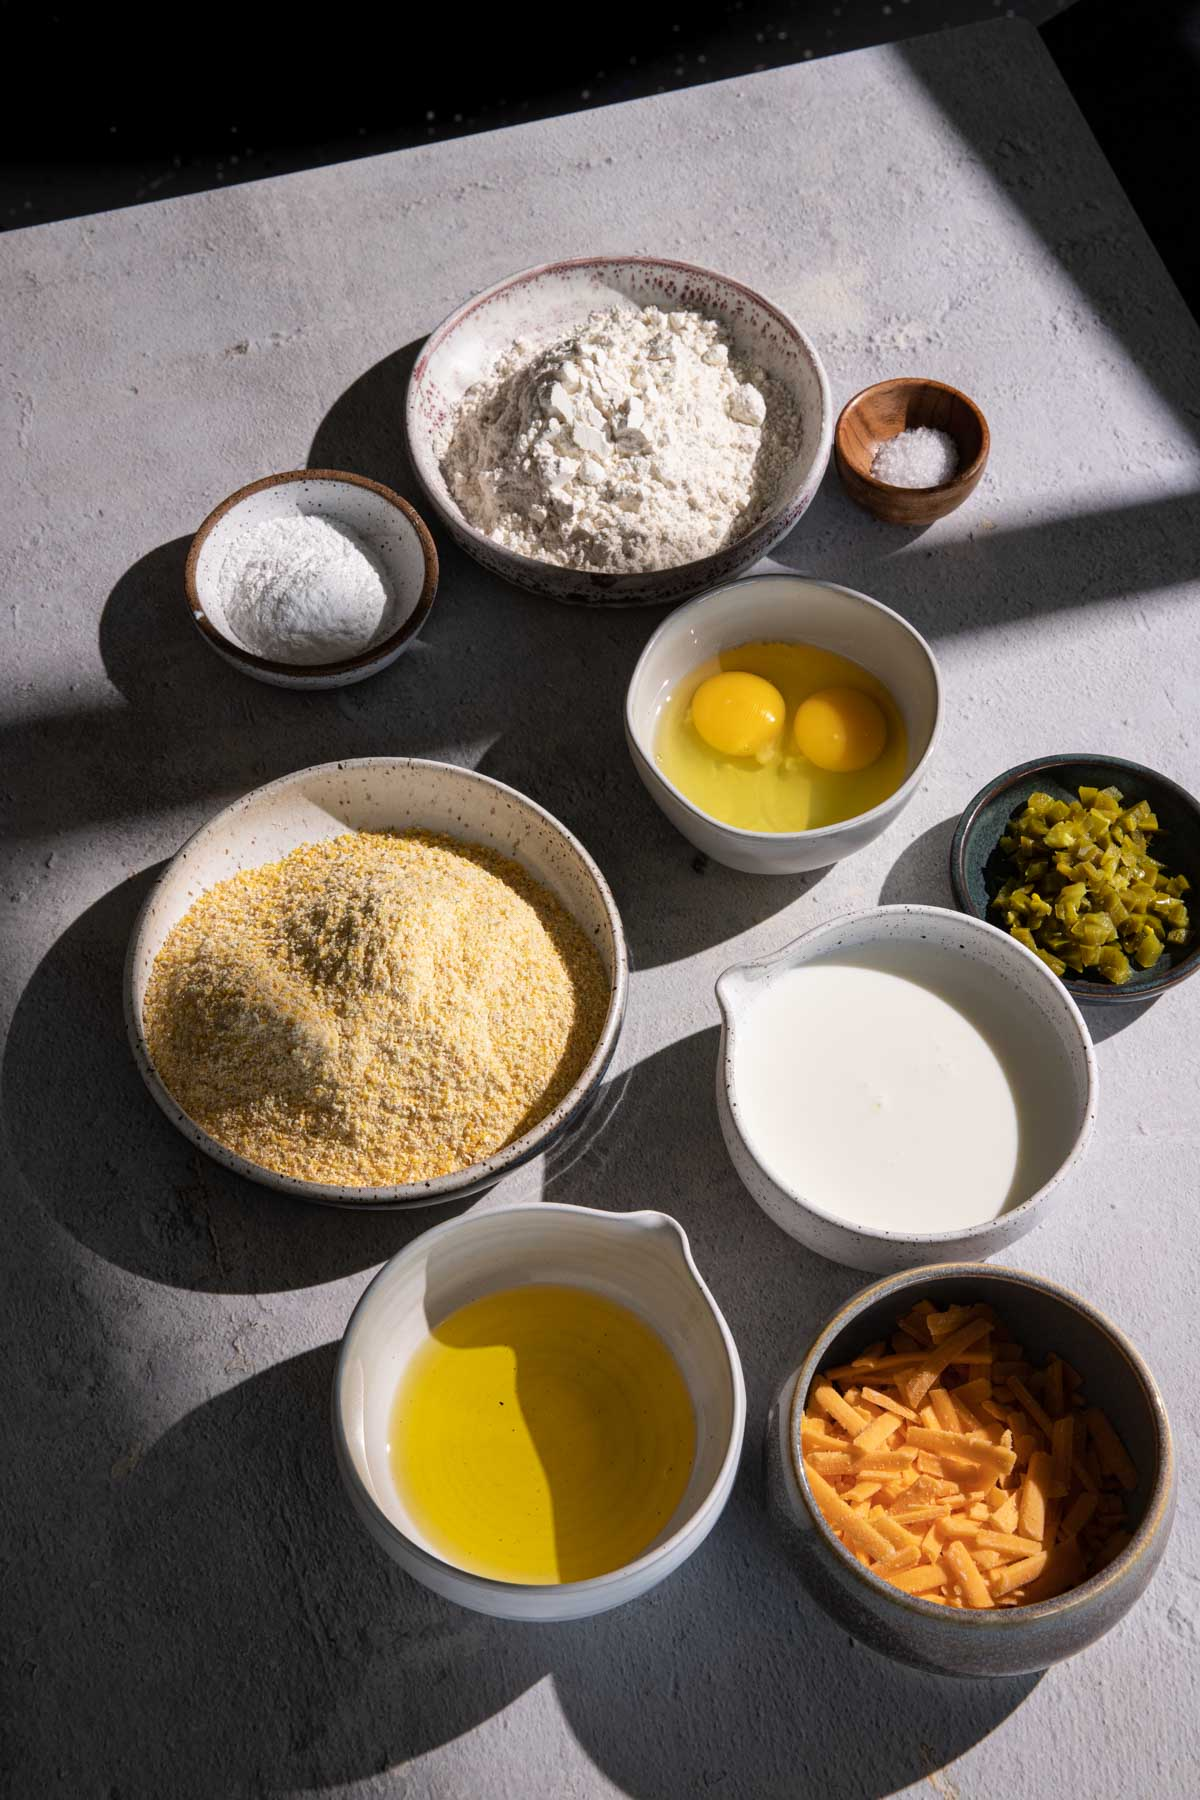 Flour, cornmeal, eggs, cheddar cheese, oil, in separate bowls